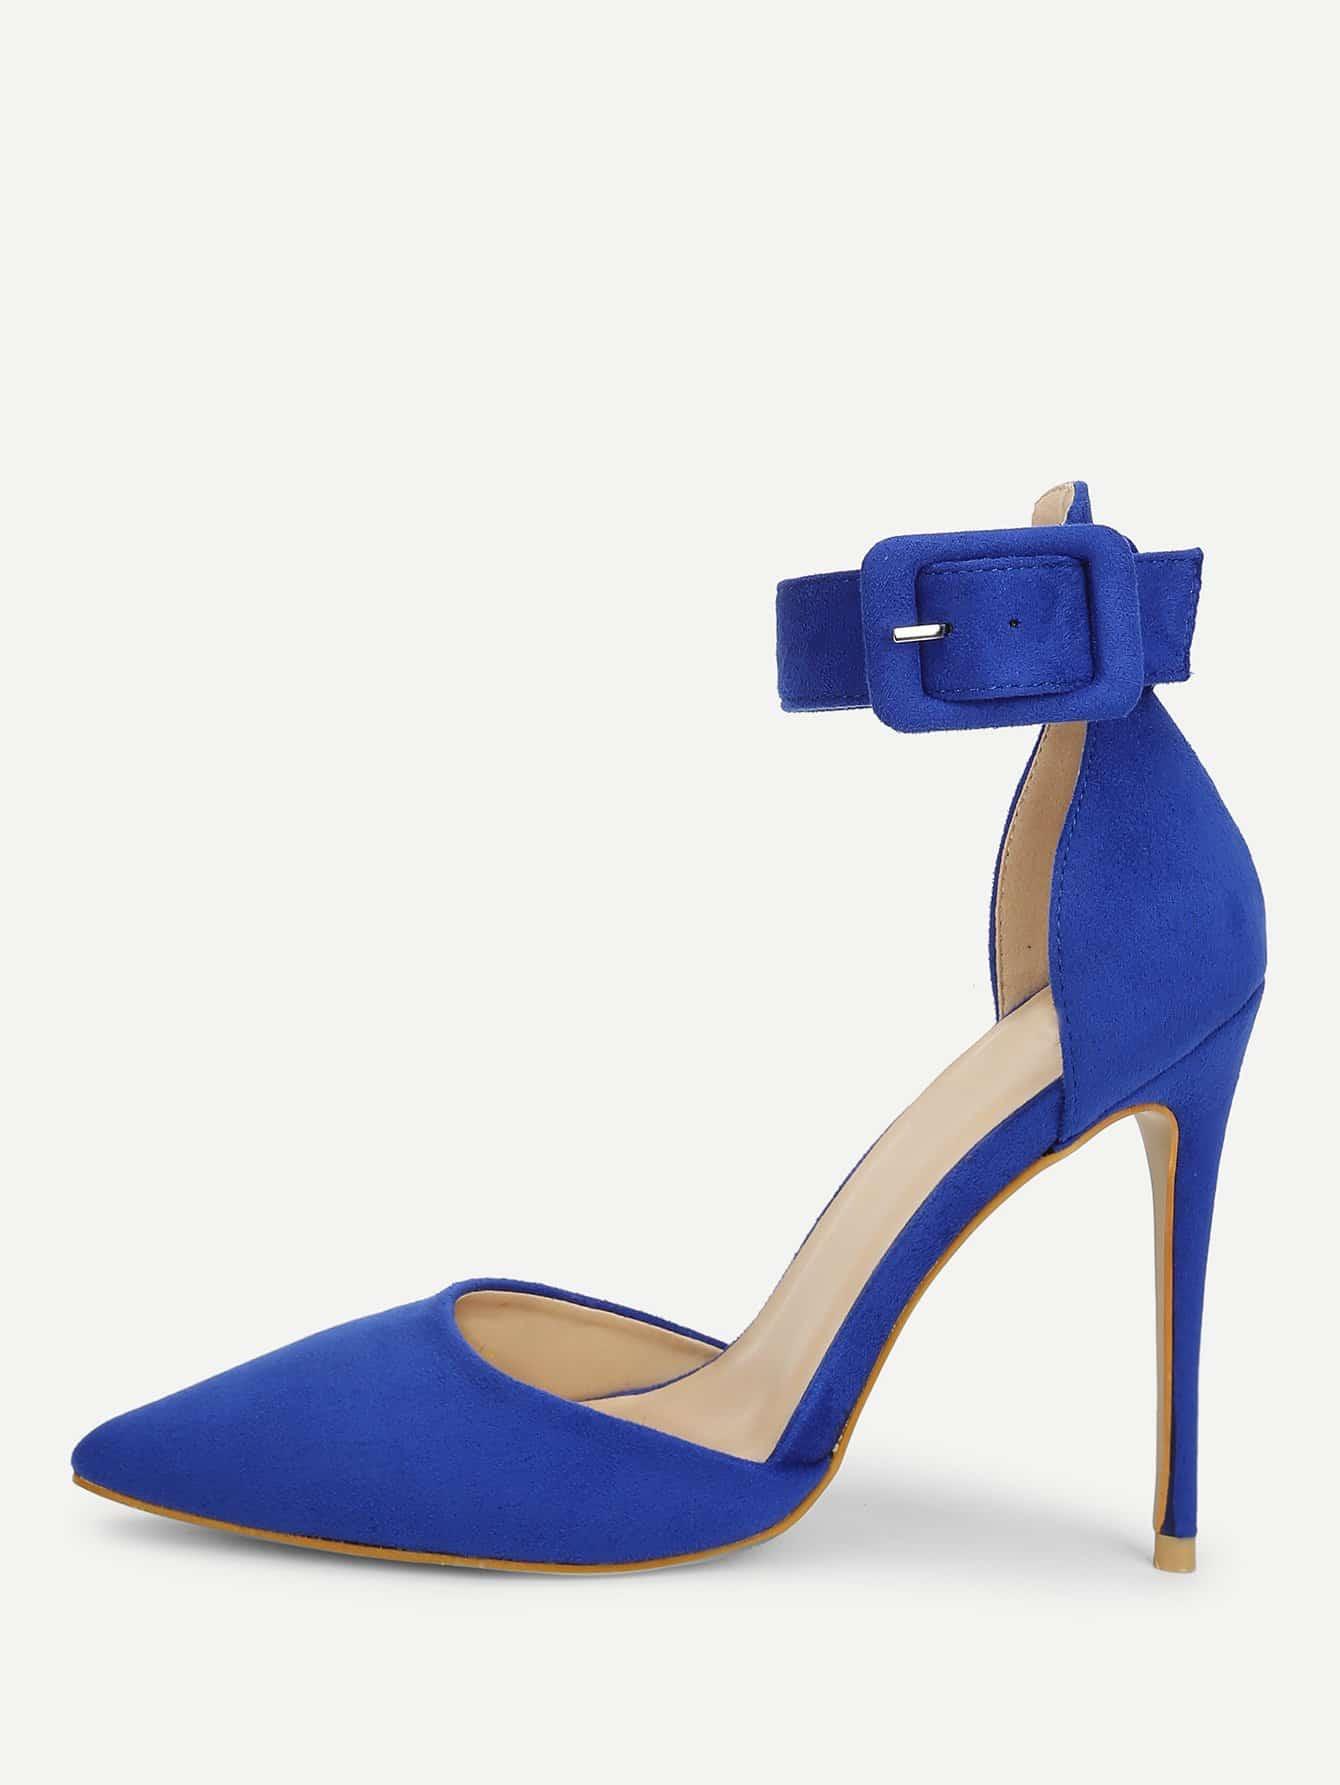 Ankle Strap Pointed Toe Stiletto Heels stiletto metallic ankle strap heels